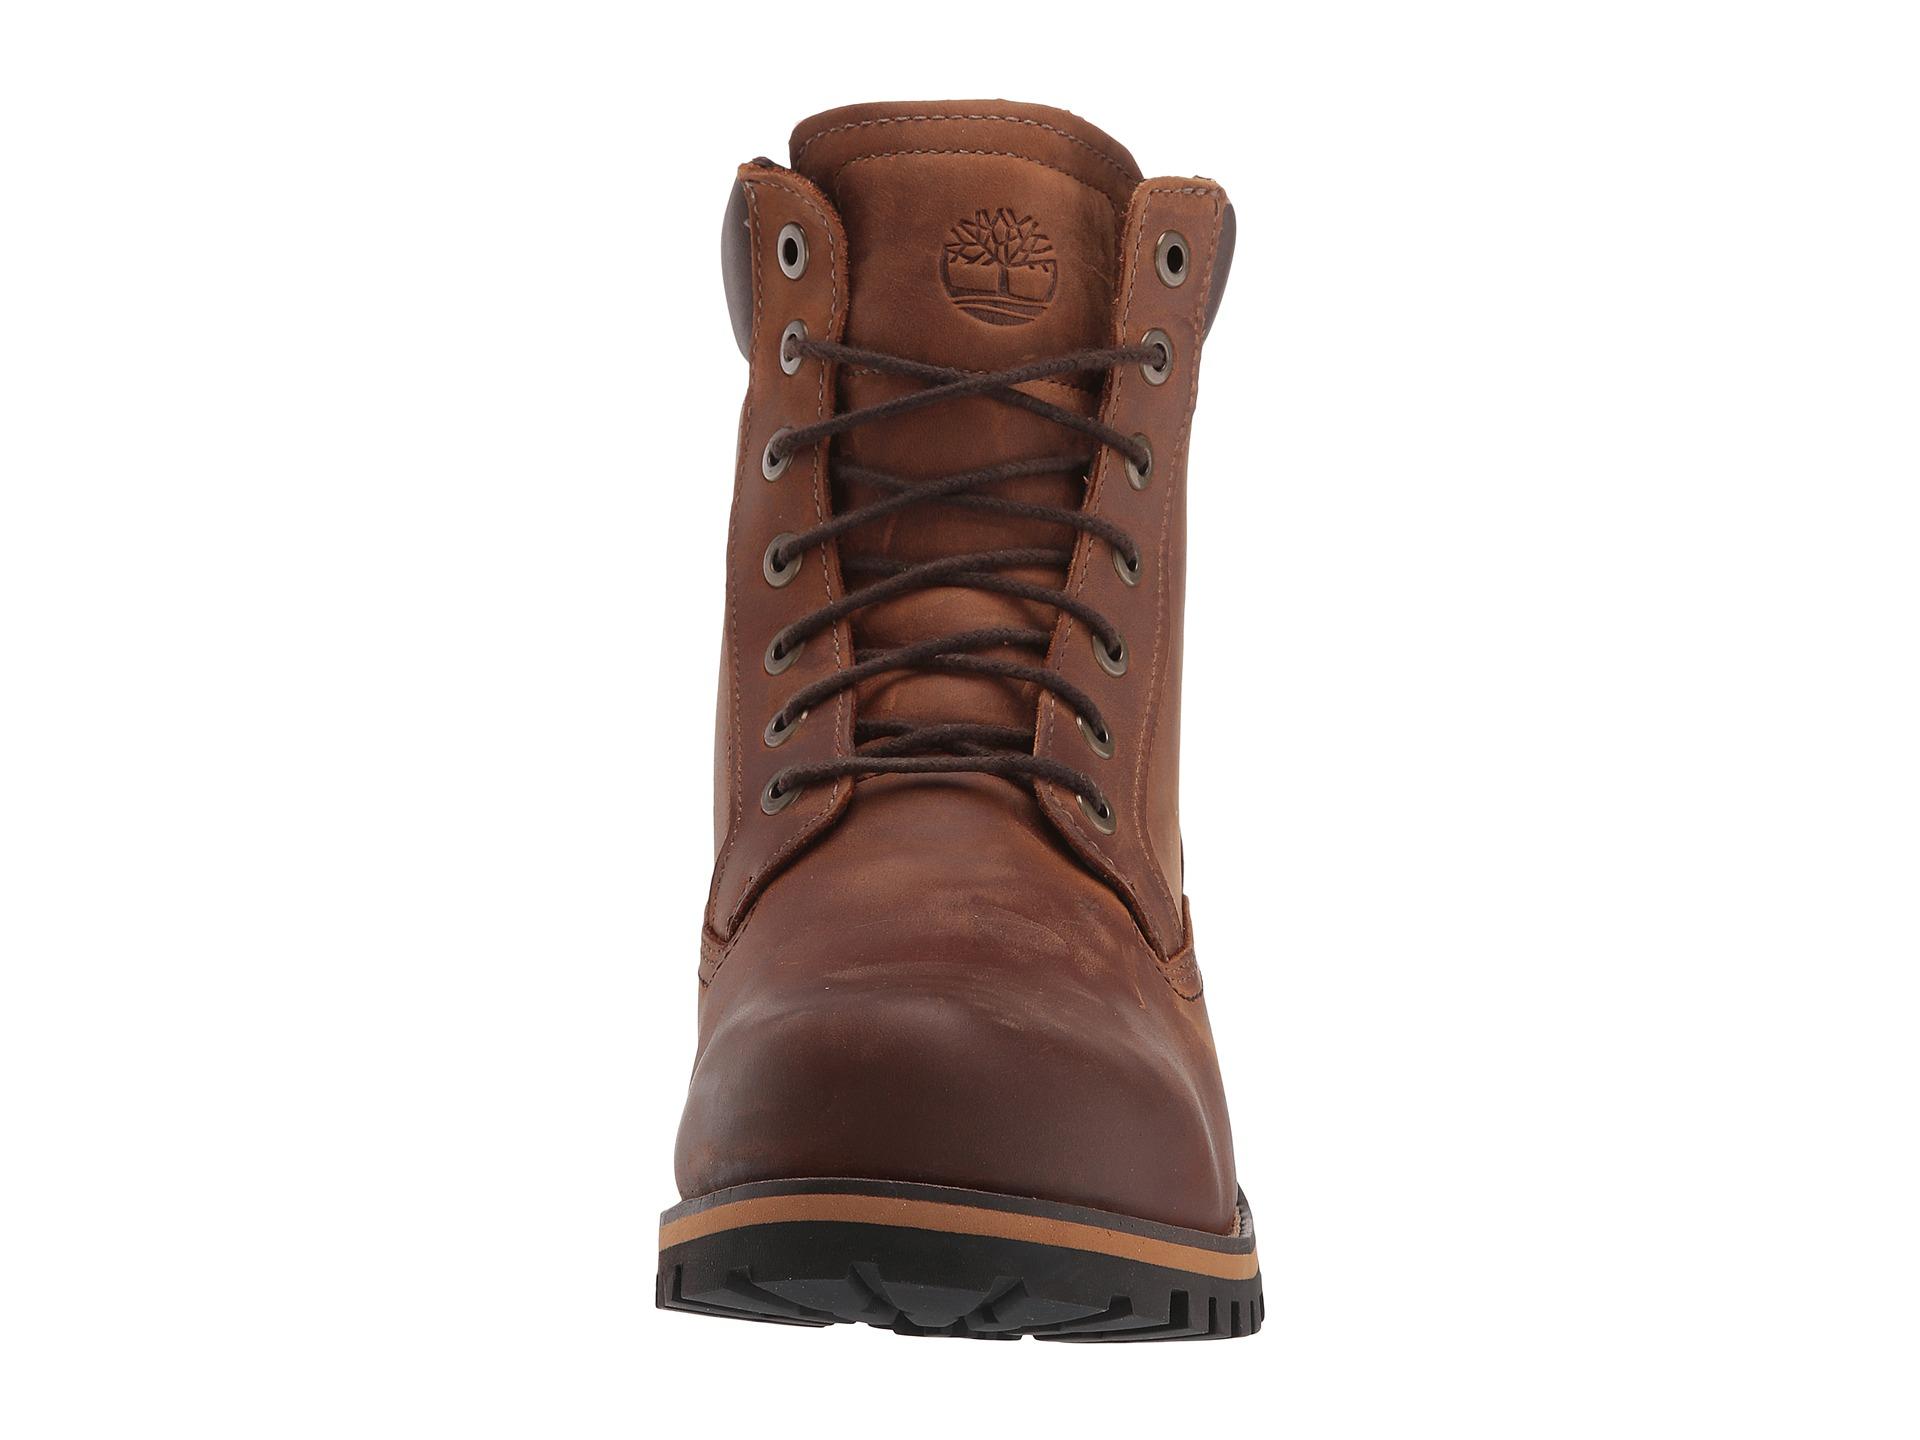 c2071f5508bfb 6 Laundry Boots Timberland Rugged Earthkeepers Men's Bye Toe Plain twaqRnxU